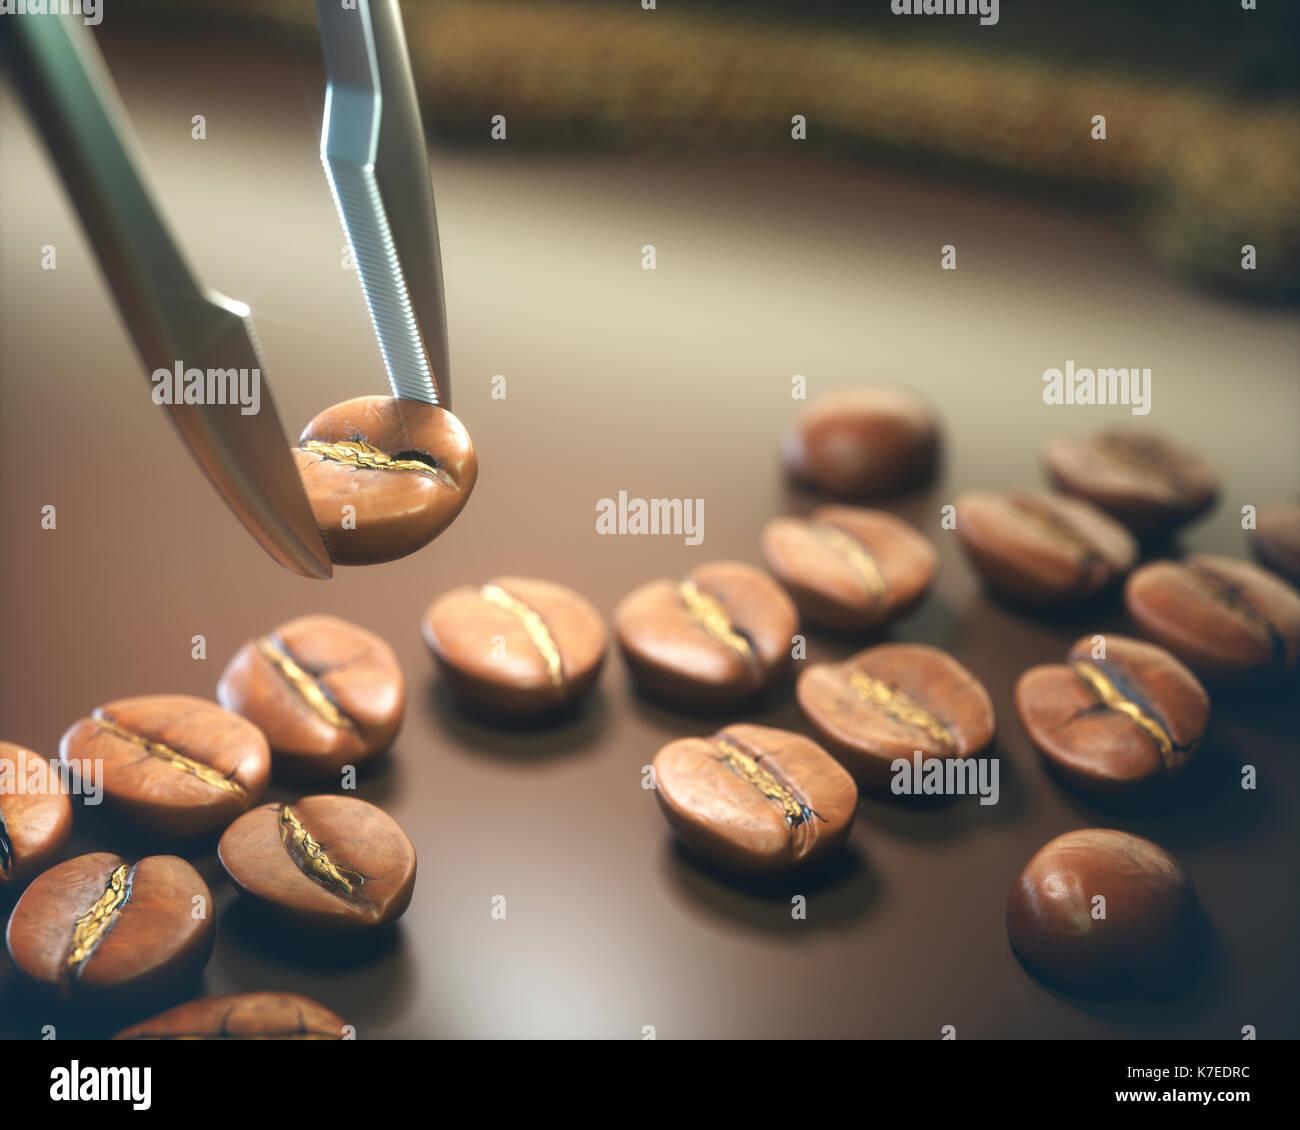 Tweezers selecting coffee bean, close up. - Stock Image